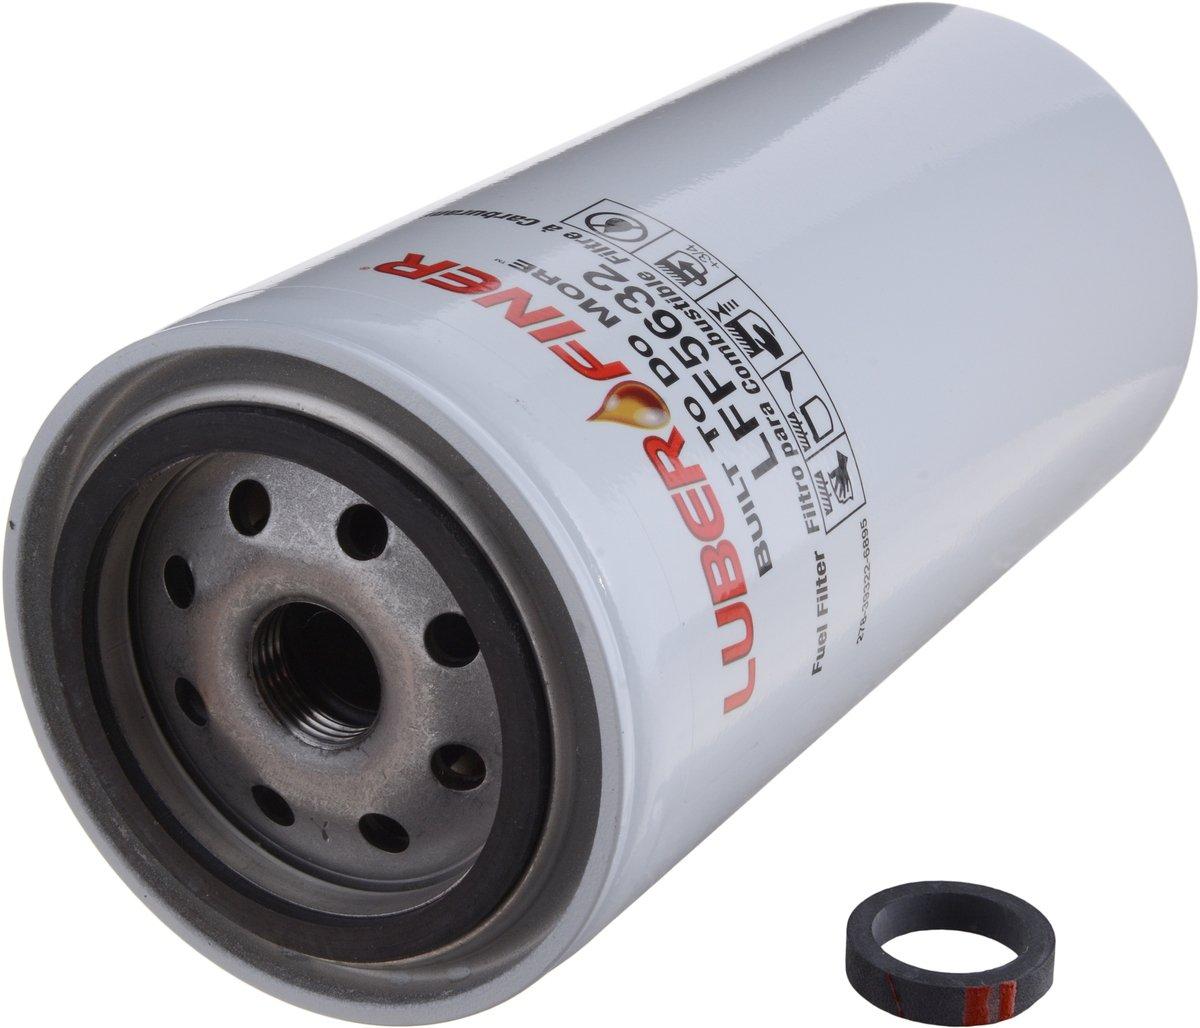 Luber-finer LFF5632 1 Pack Automotive Accessories